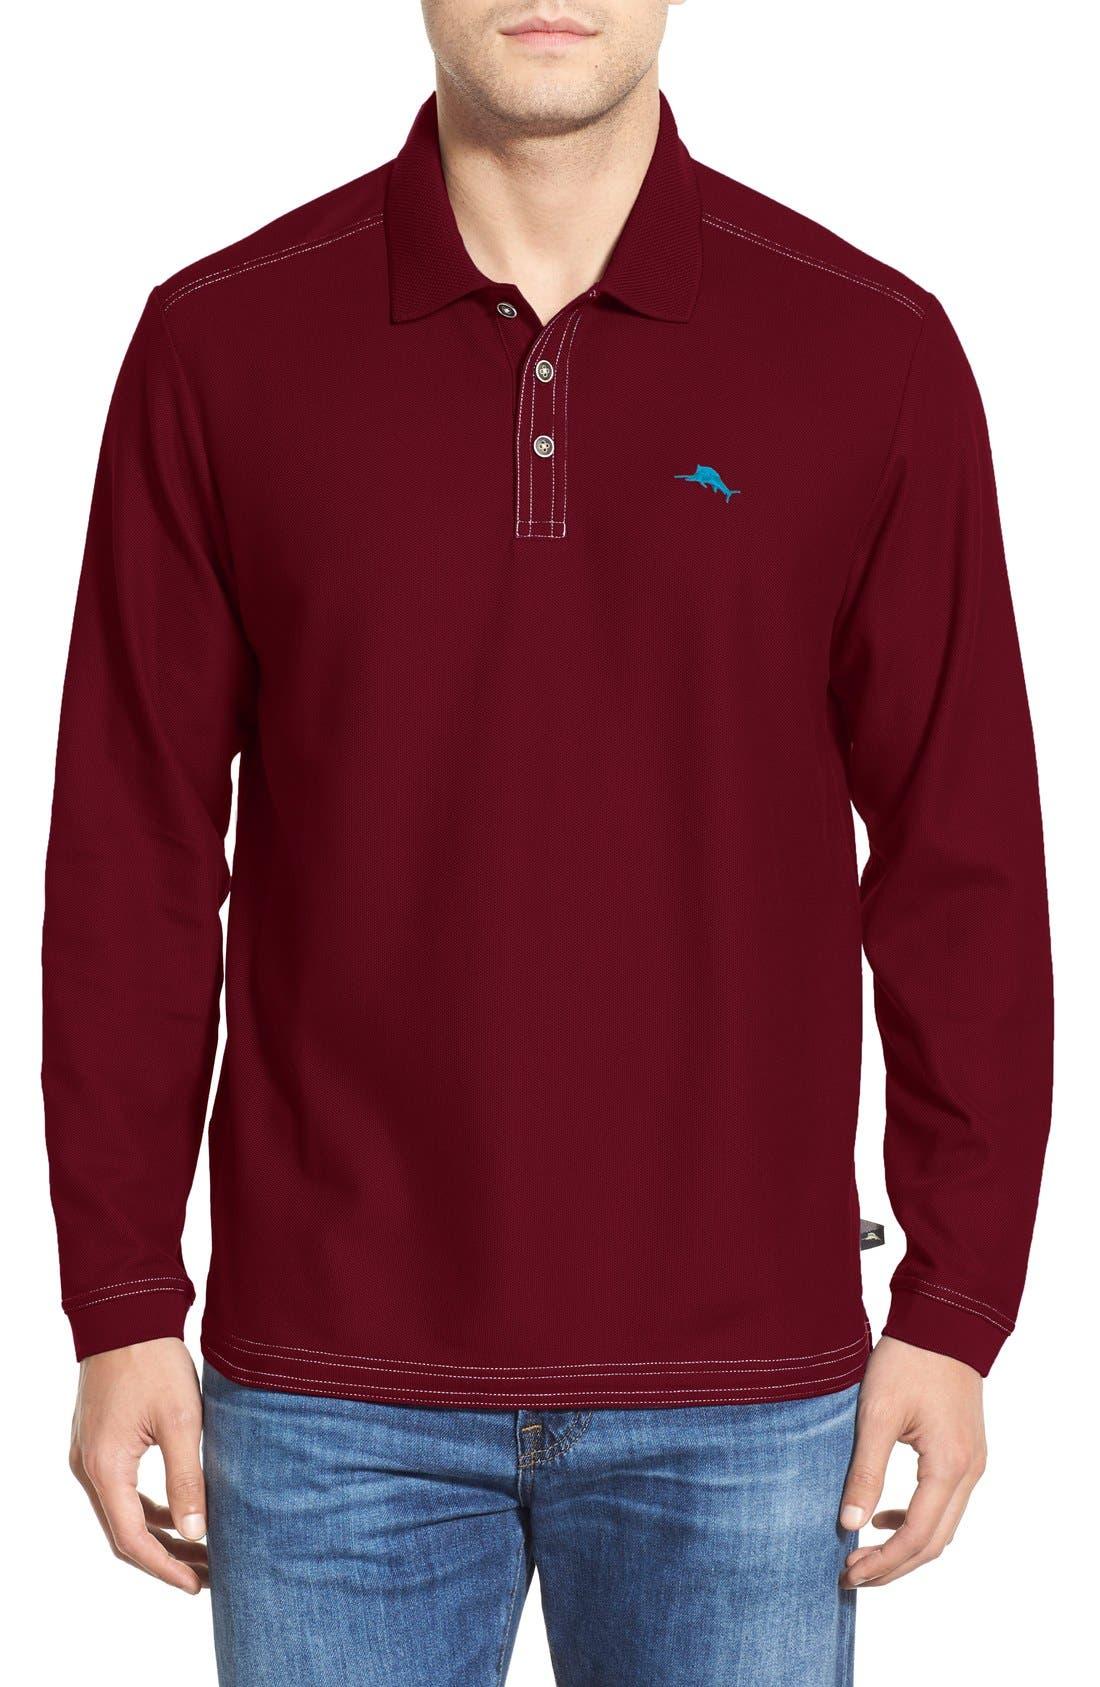 Emfielder Long Sleeve Polo,                             Main thumbnail 1, color,                             Cabernet Red